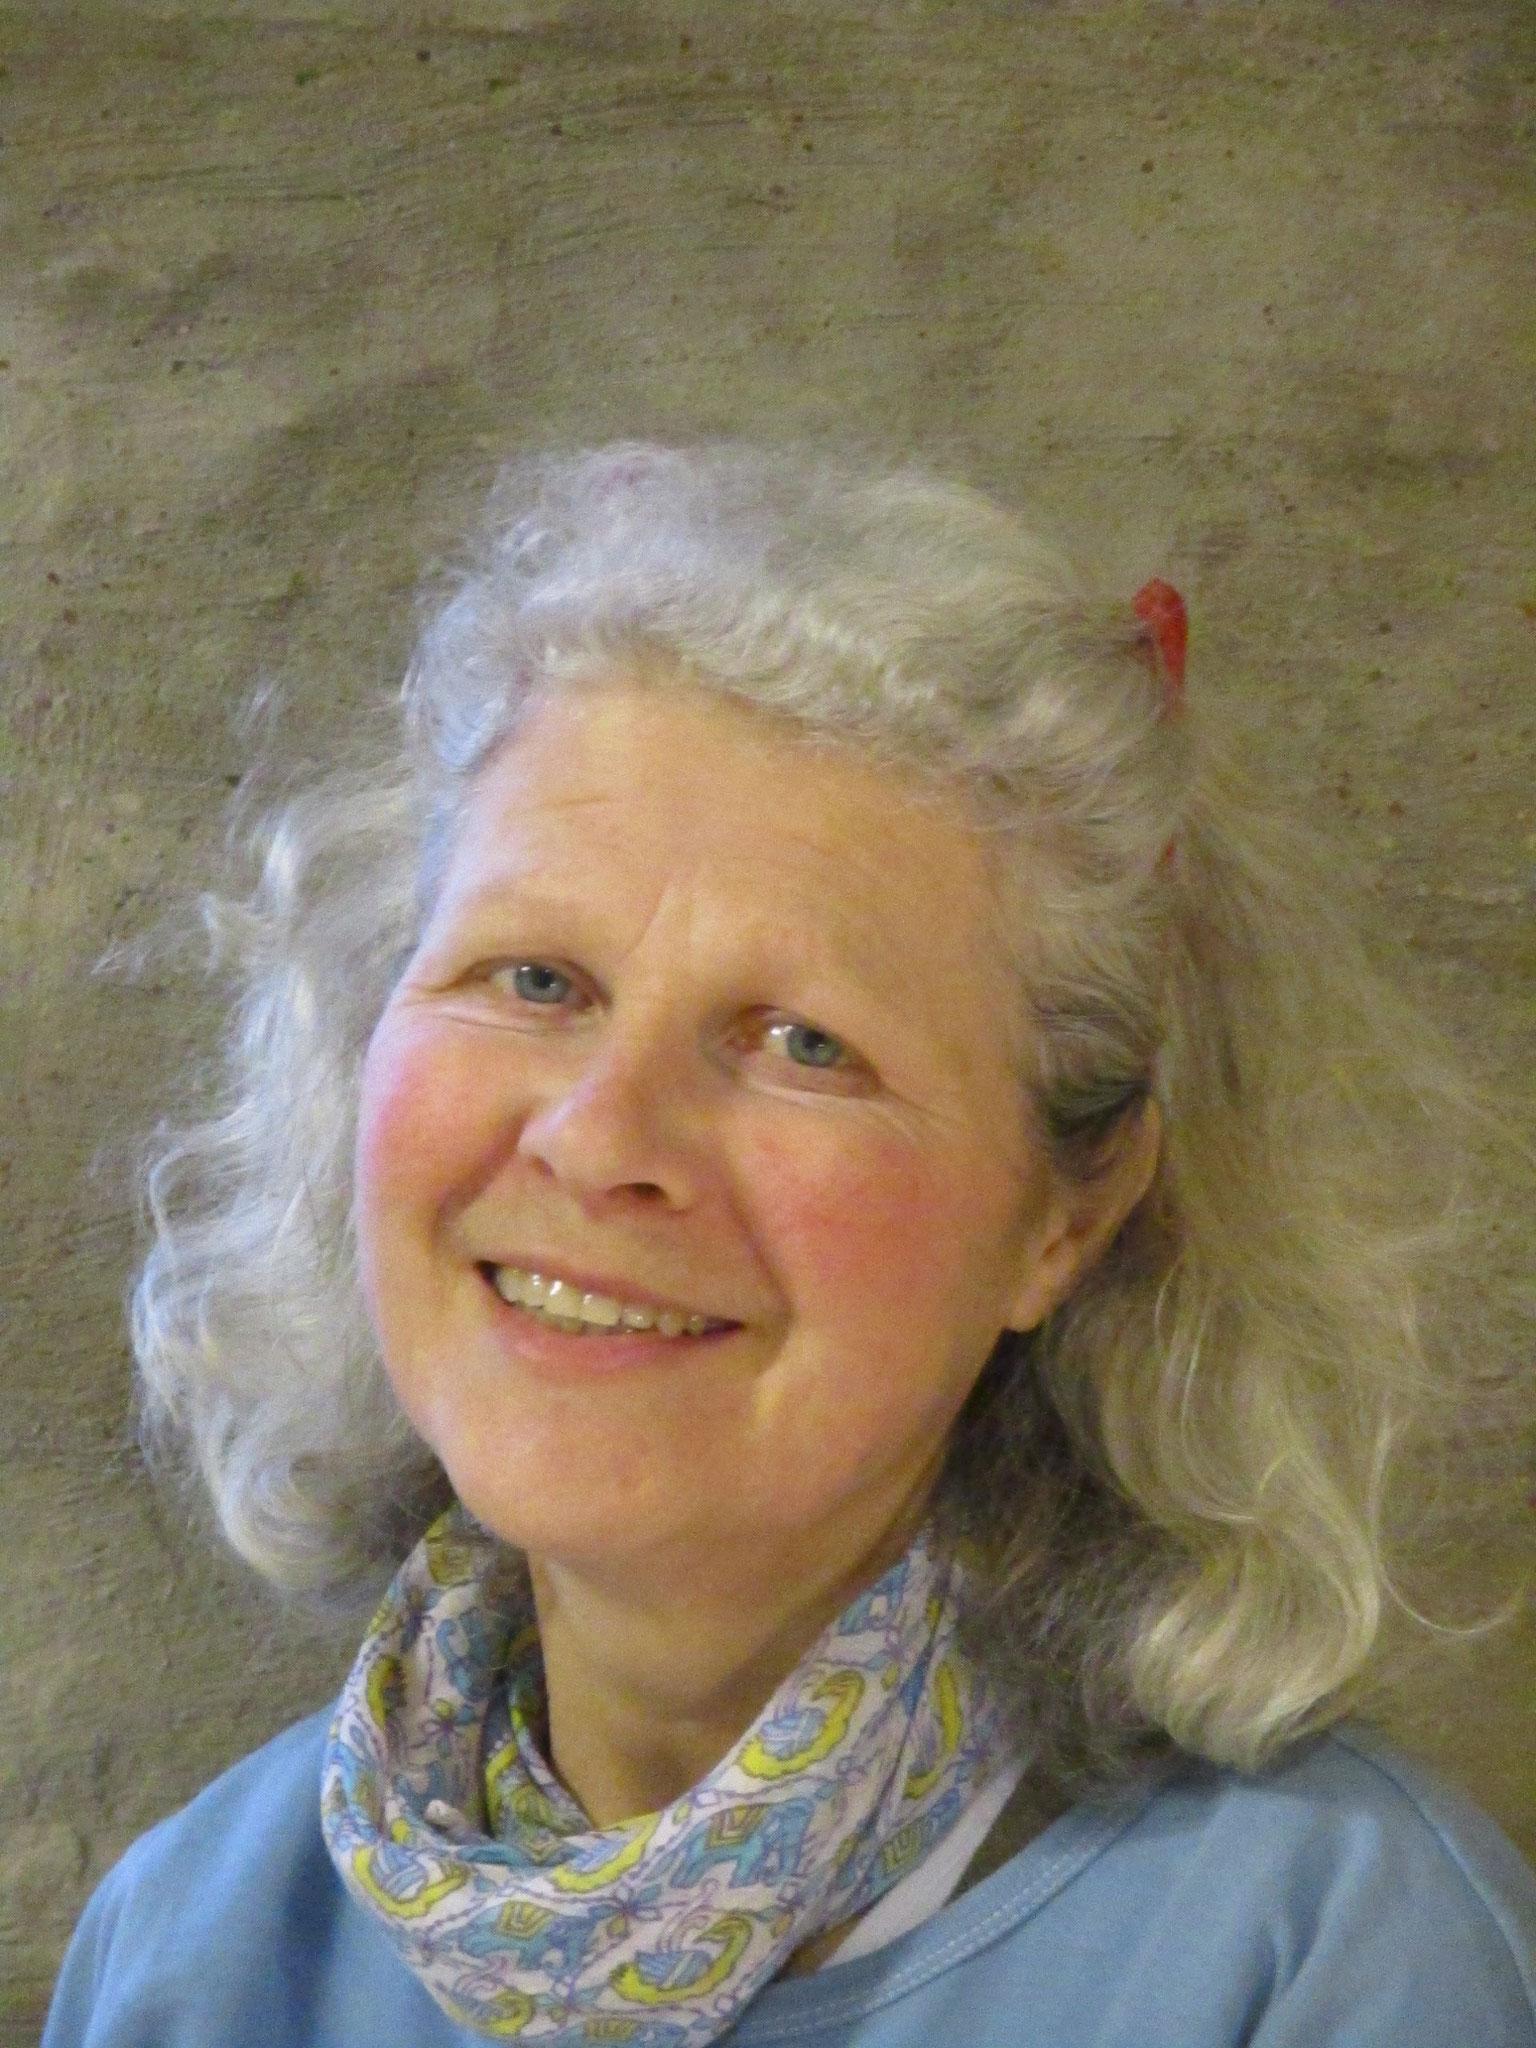 Brigitte Preuß  Keramik in der Salzkothe